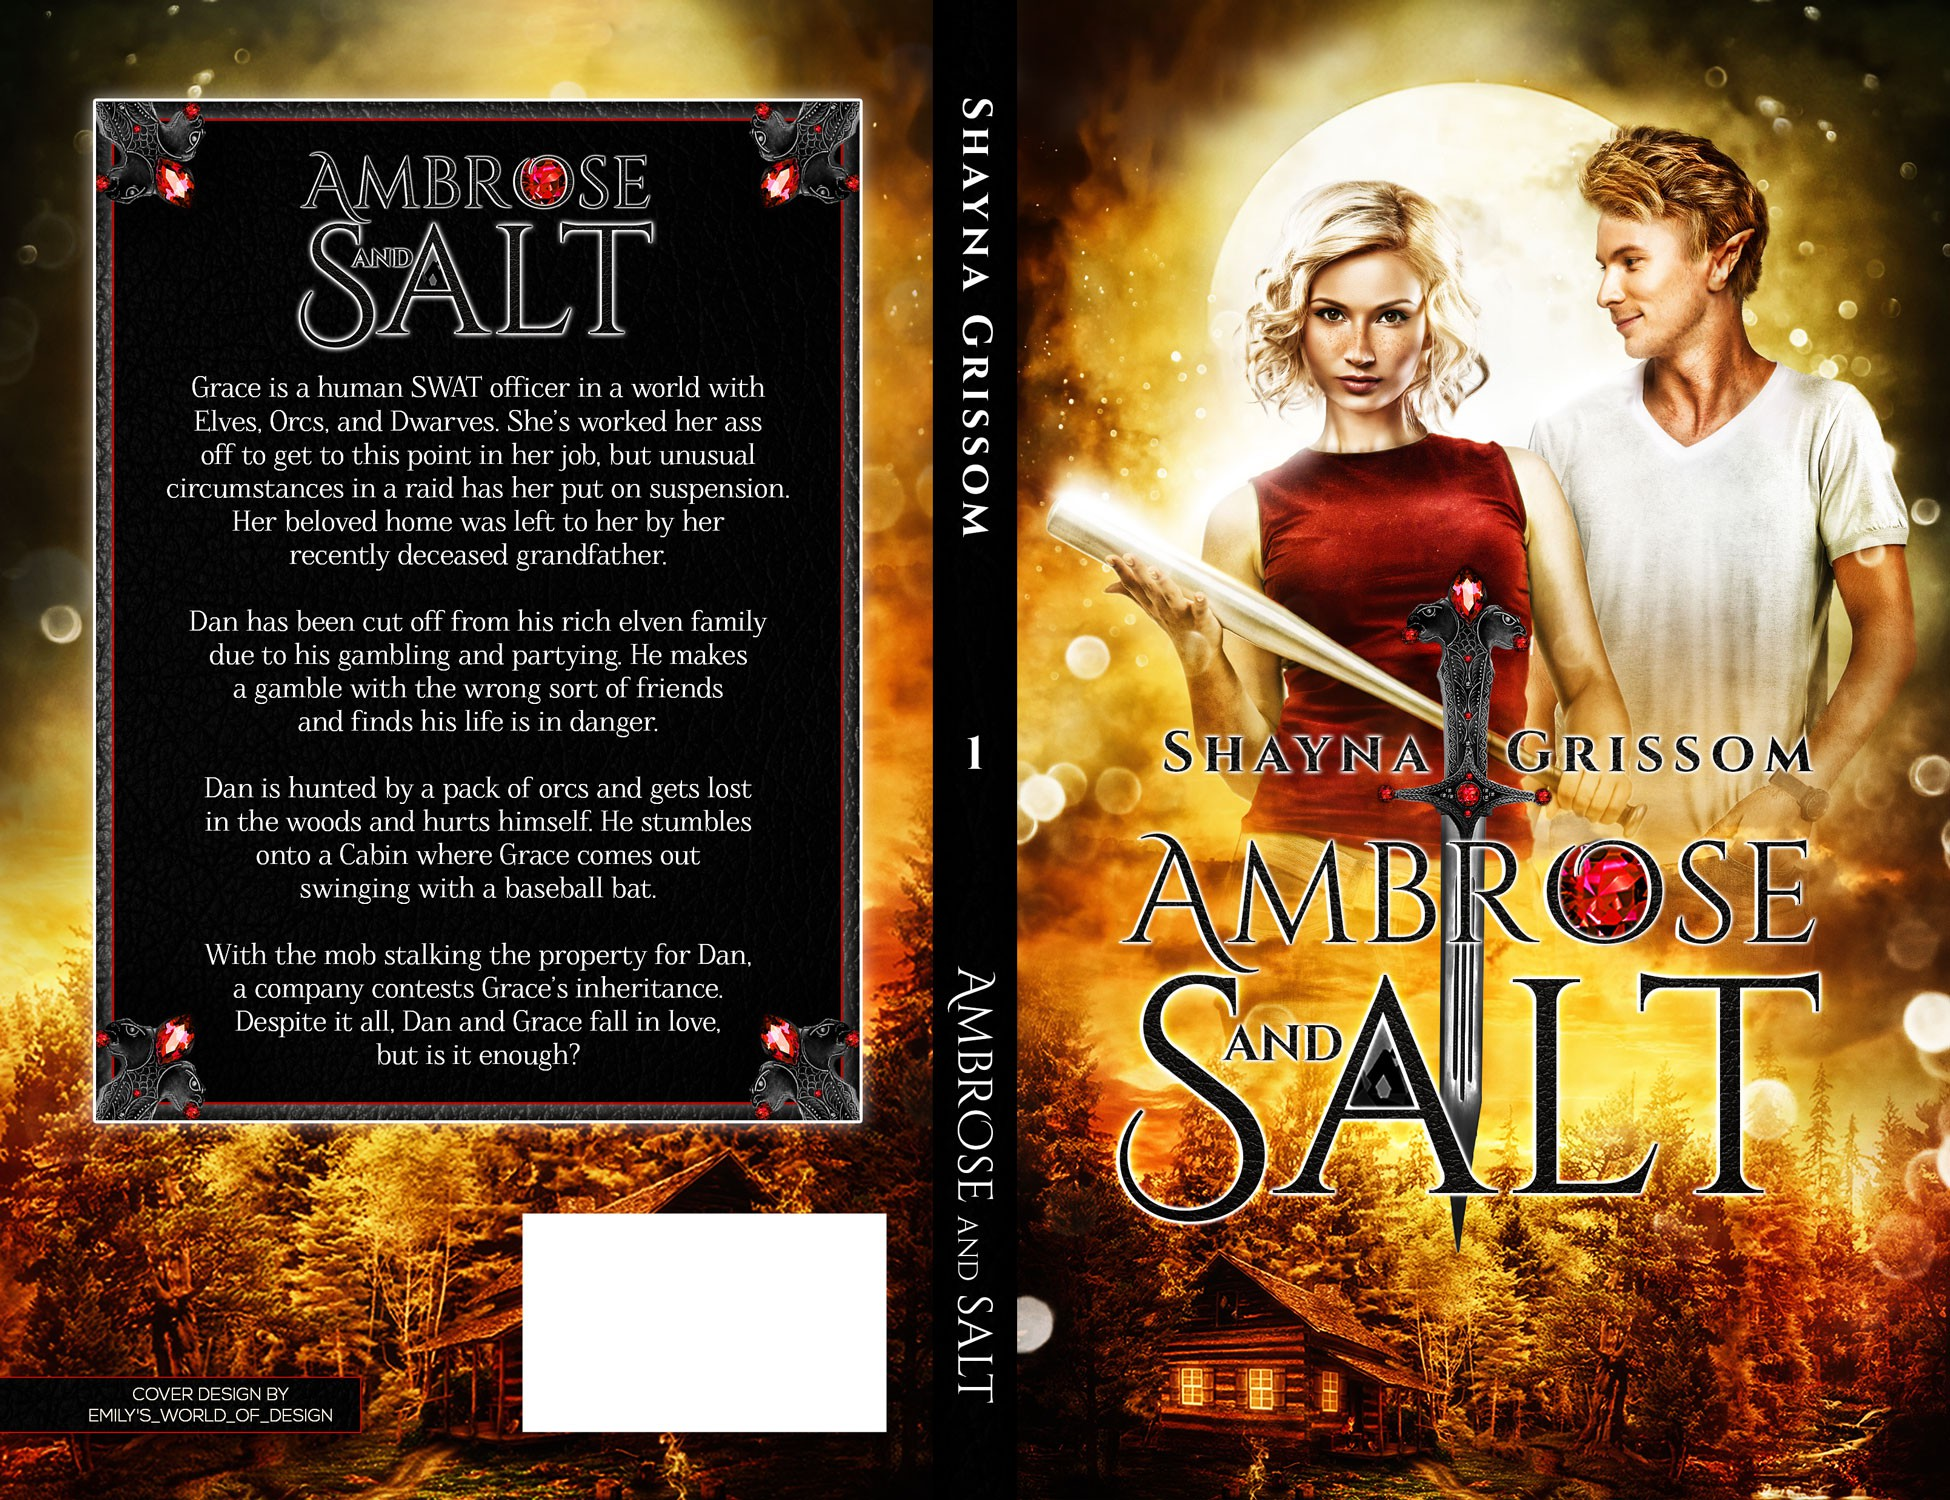 Ambrose and Salt